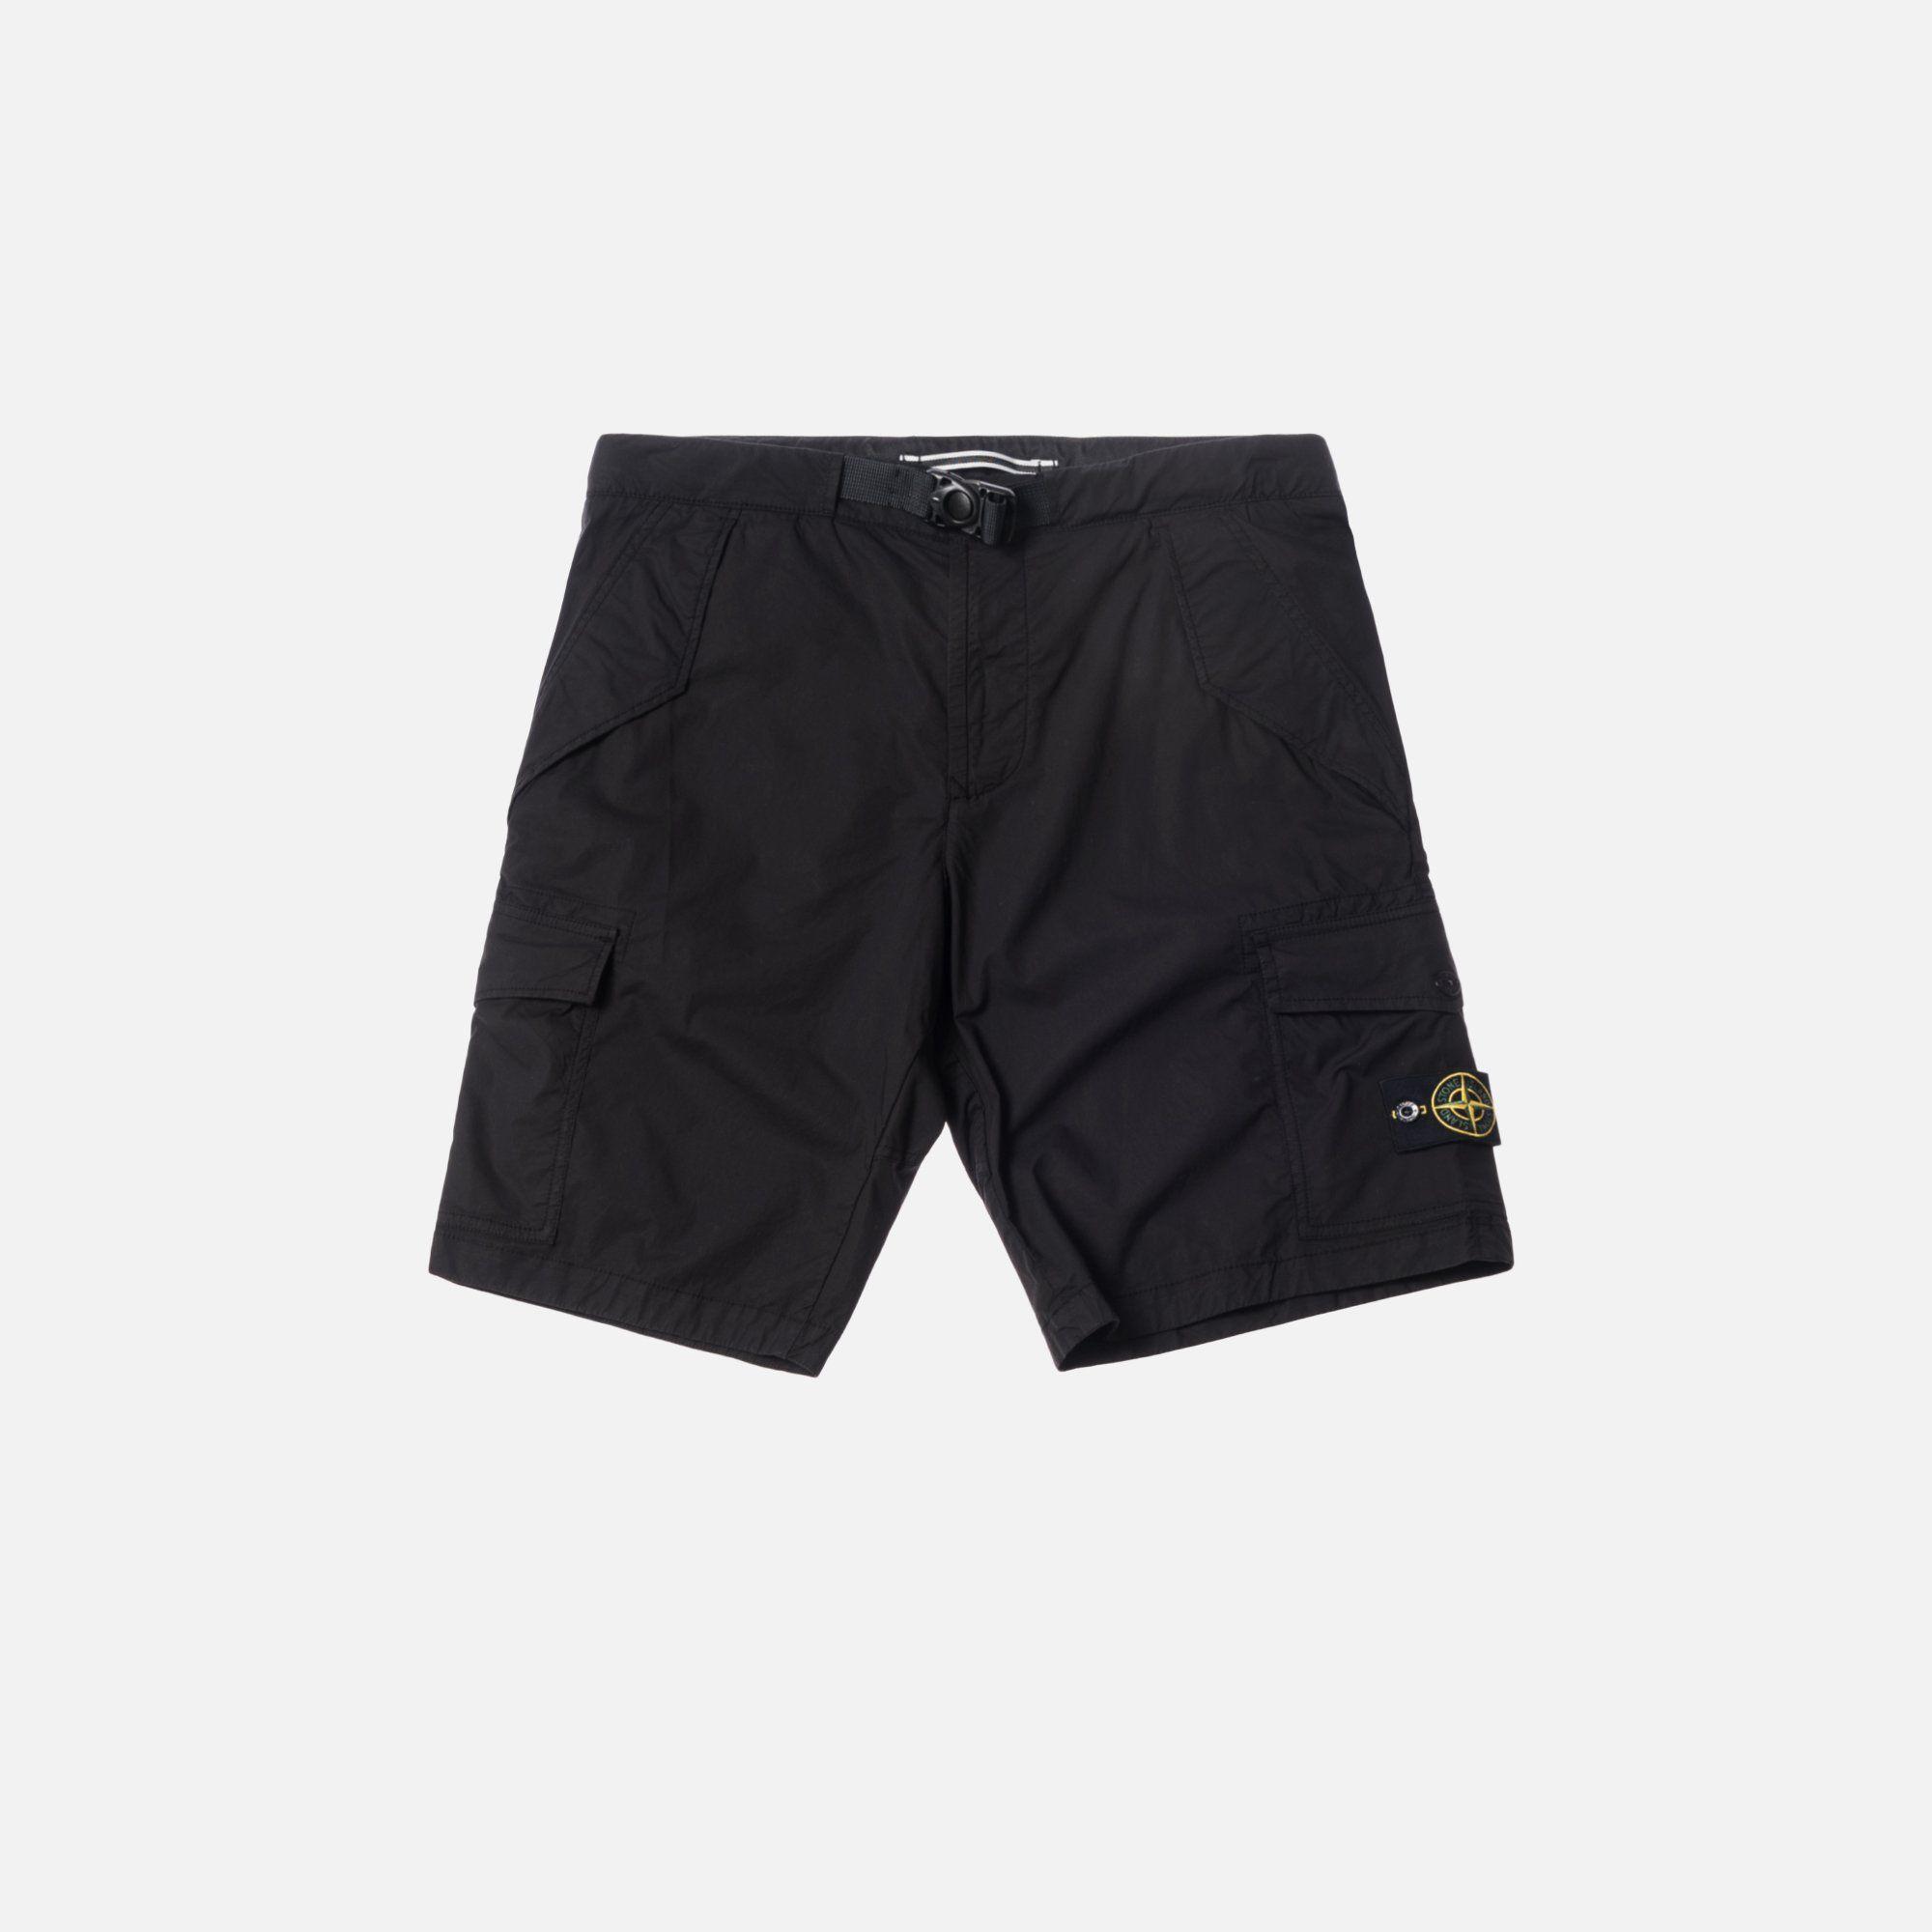 Stone Island Bermuda Shorts Black 28 Kleding Kleding